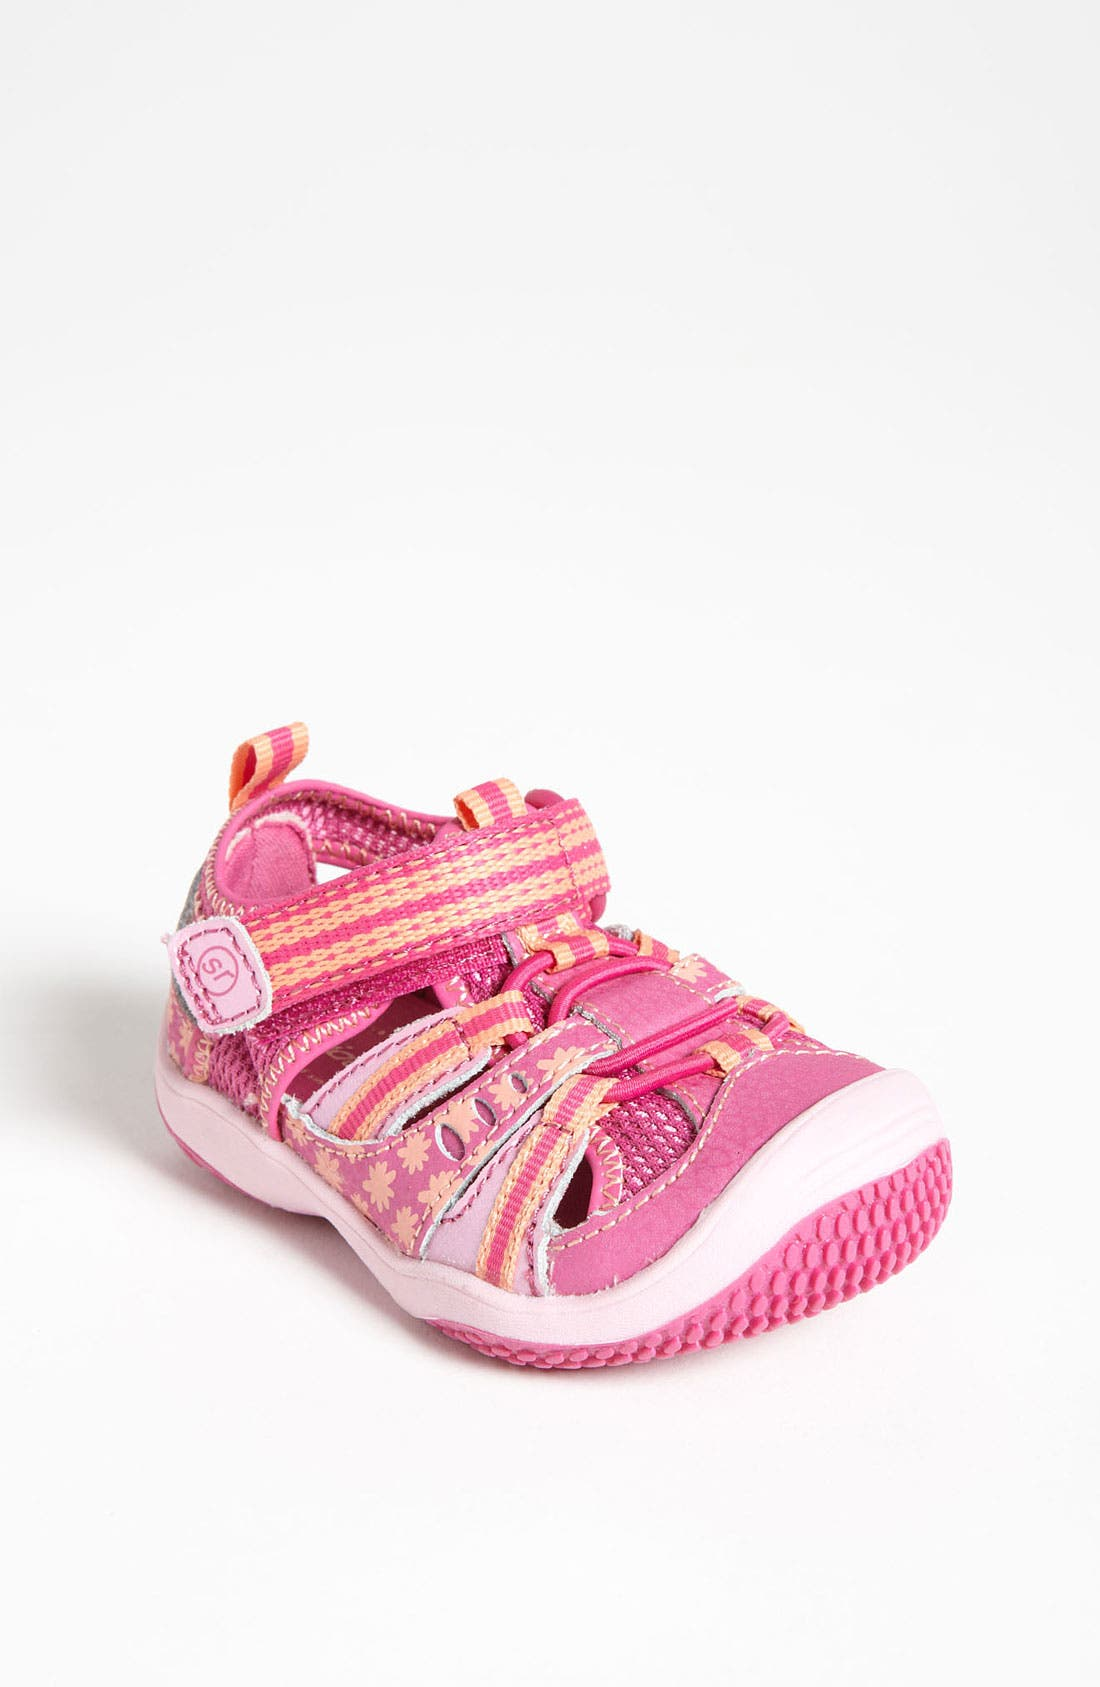 Alternate Image 1 Selected - Stride Rite 'Baby Petra' Sandal (Baby, Walker & Toddler)